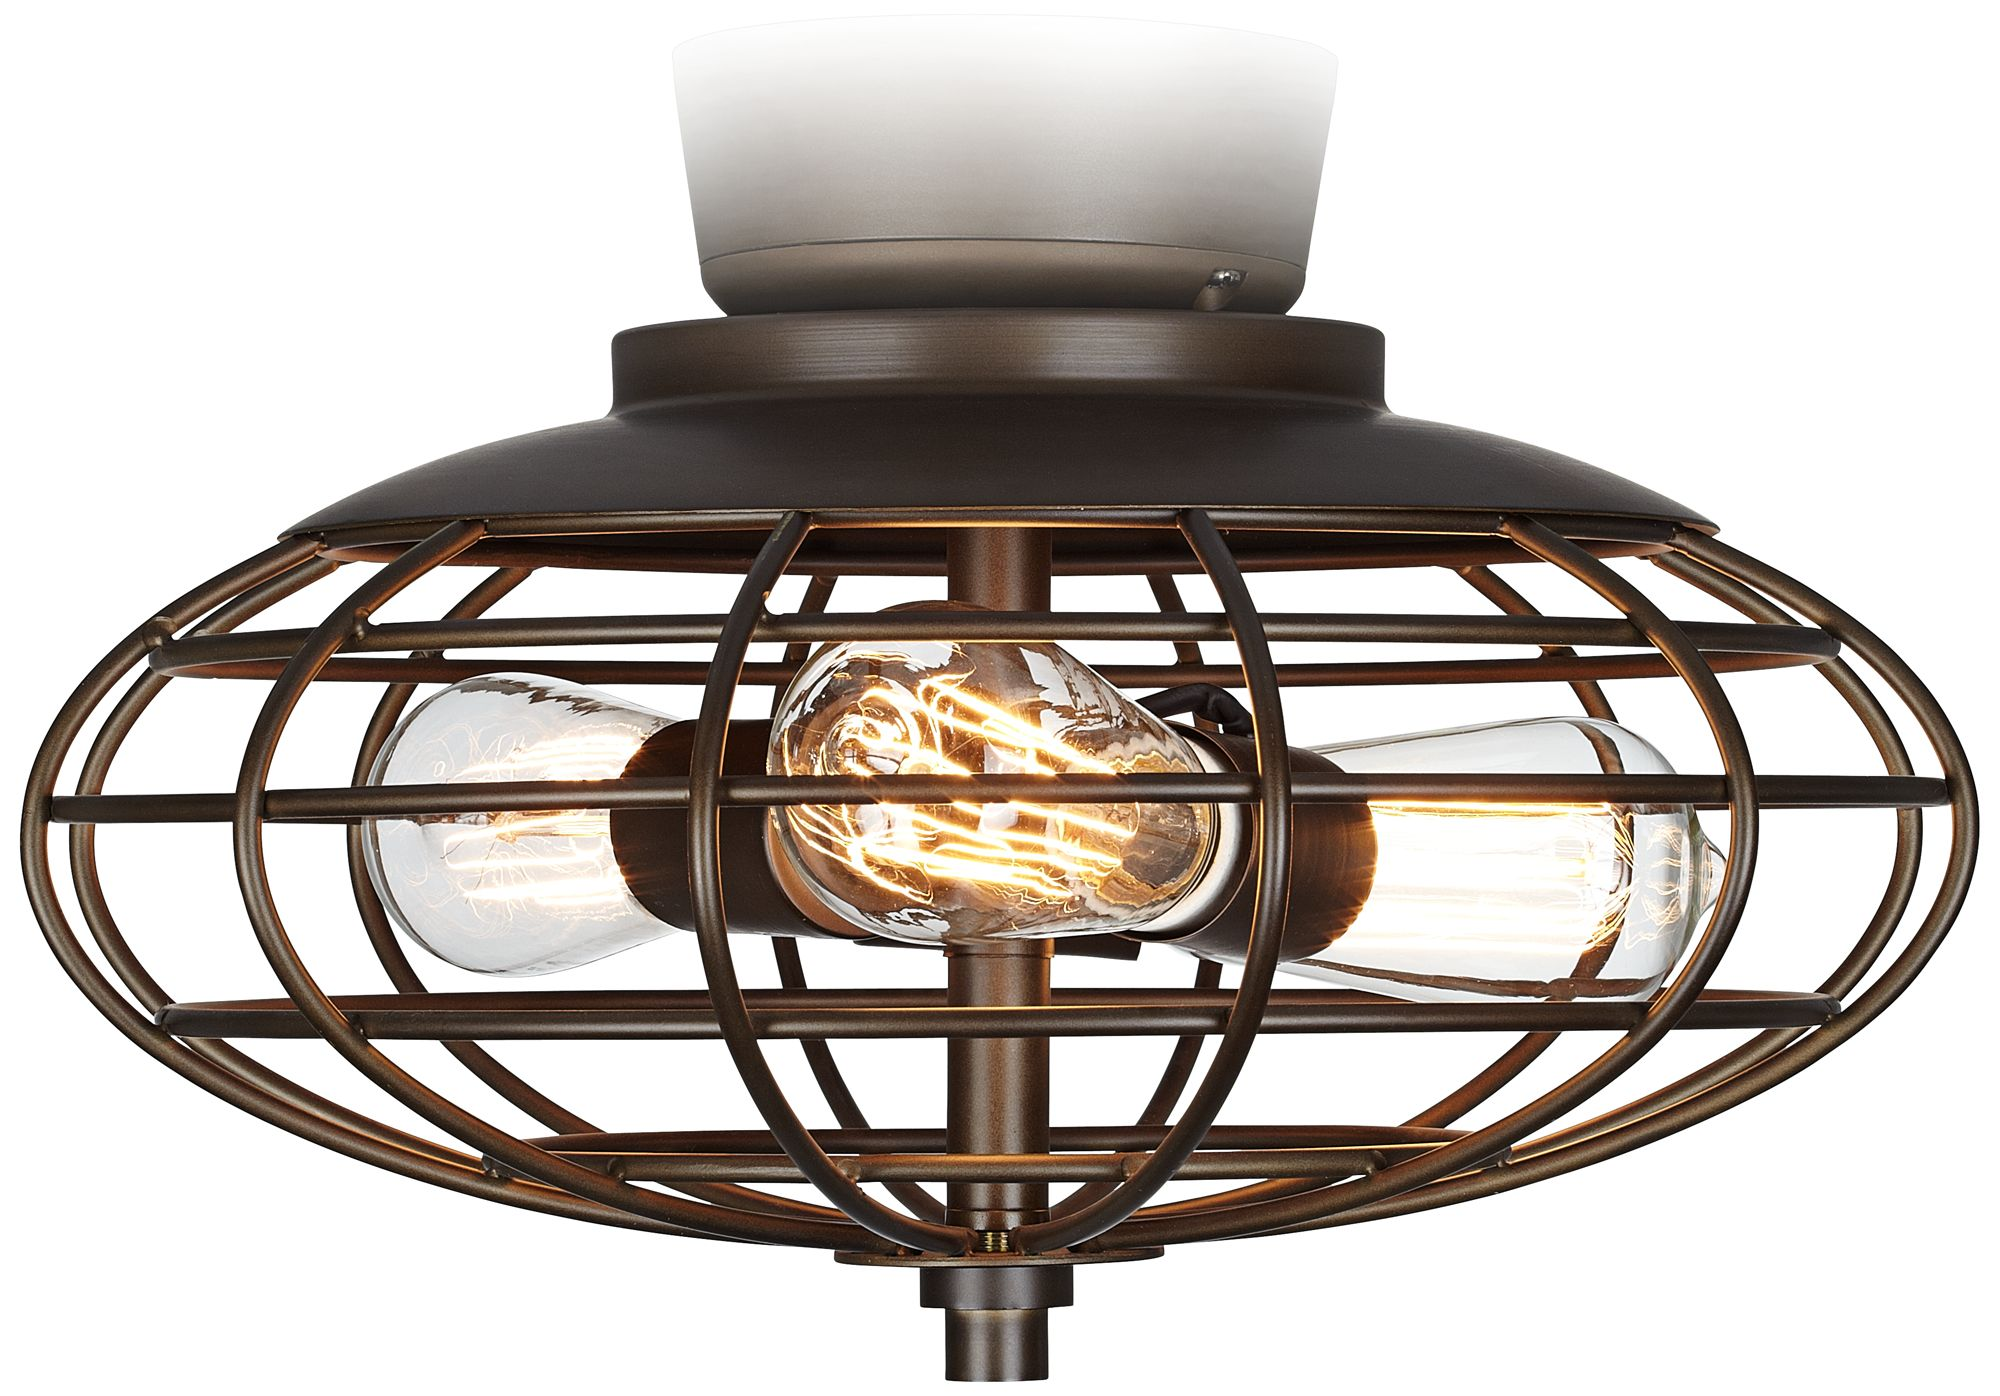 ceiling fan light kits 2005 ford focus zx5 radio wiring diagram lamps plus oil rubbed bronze open cage 3 60 watt kit